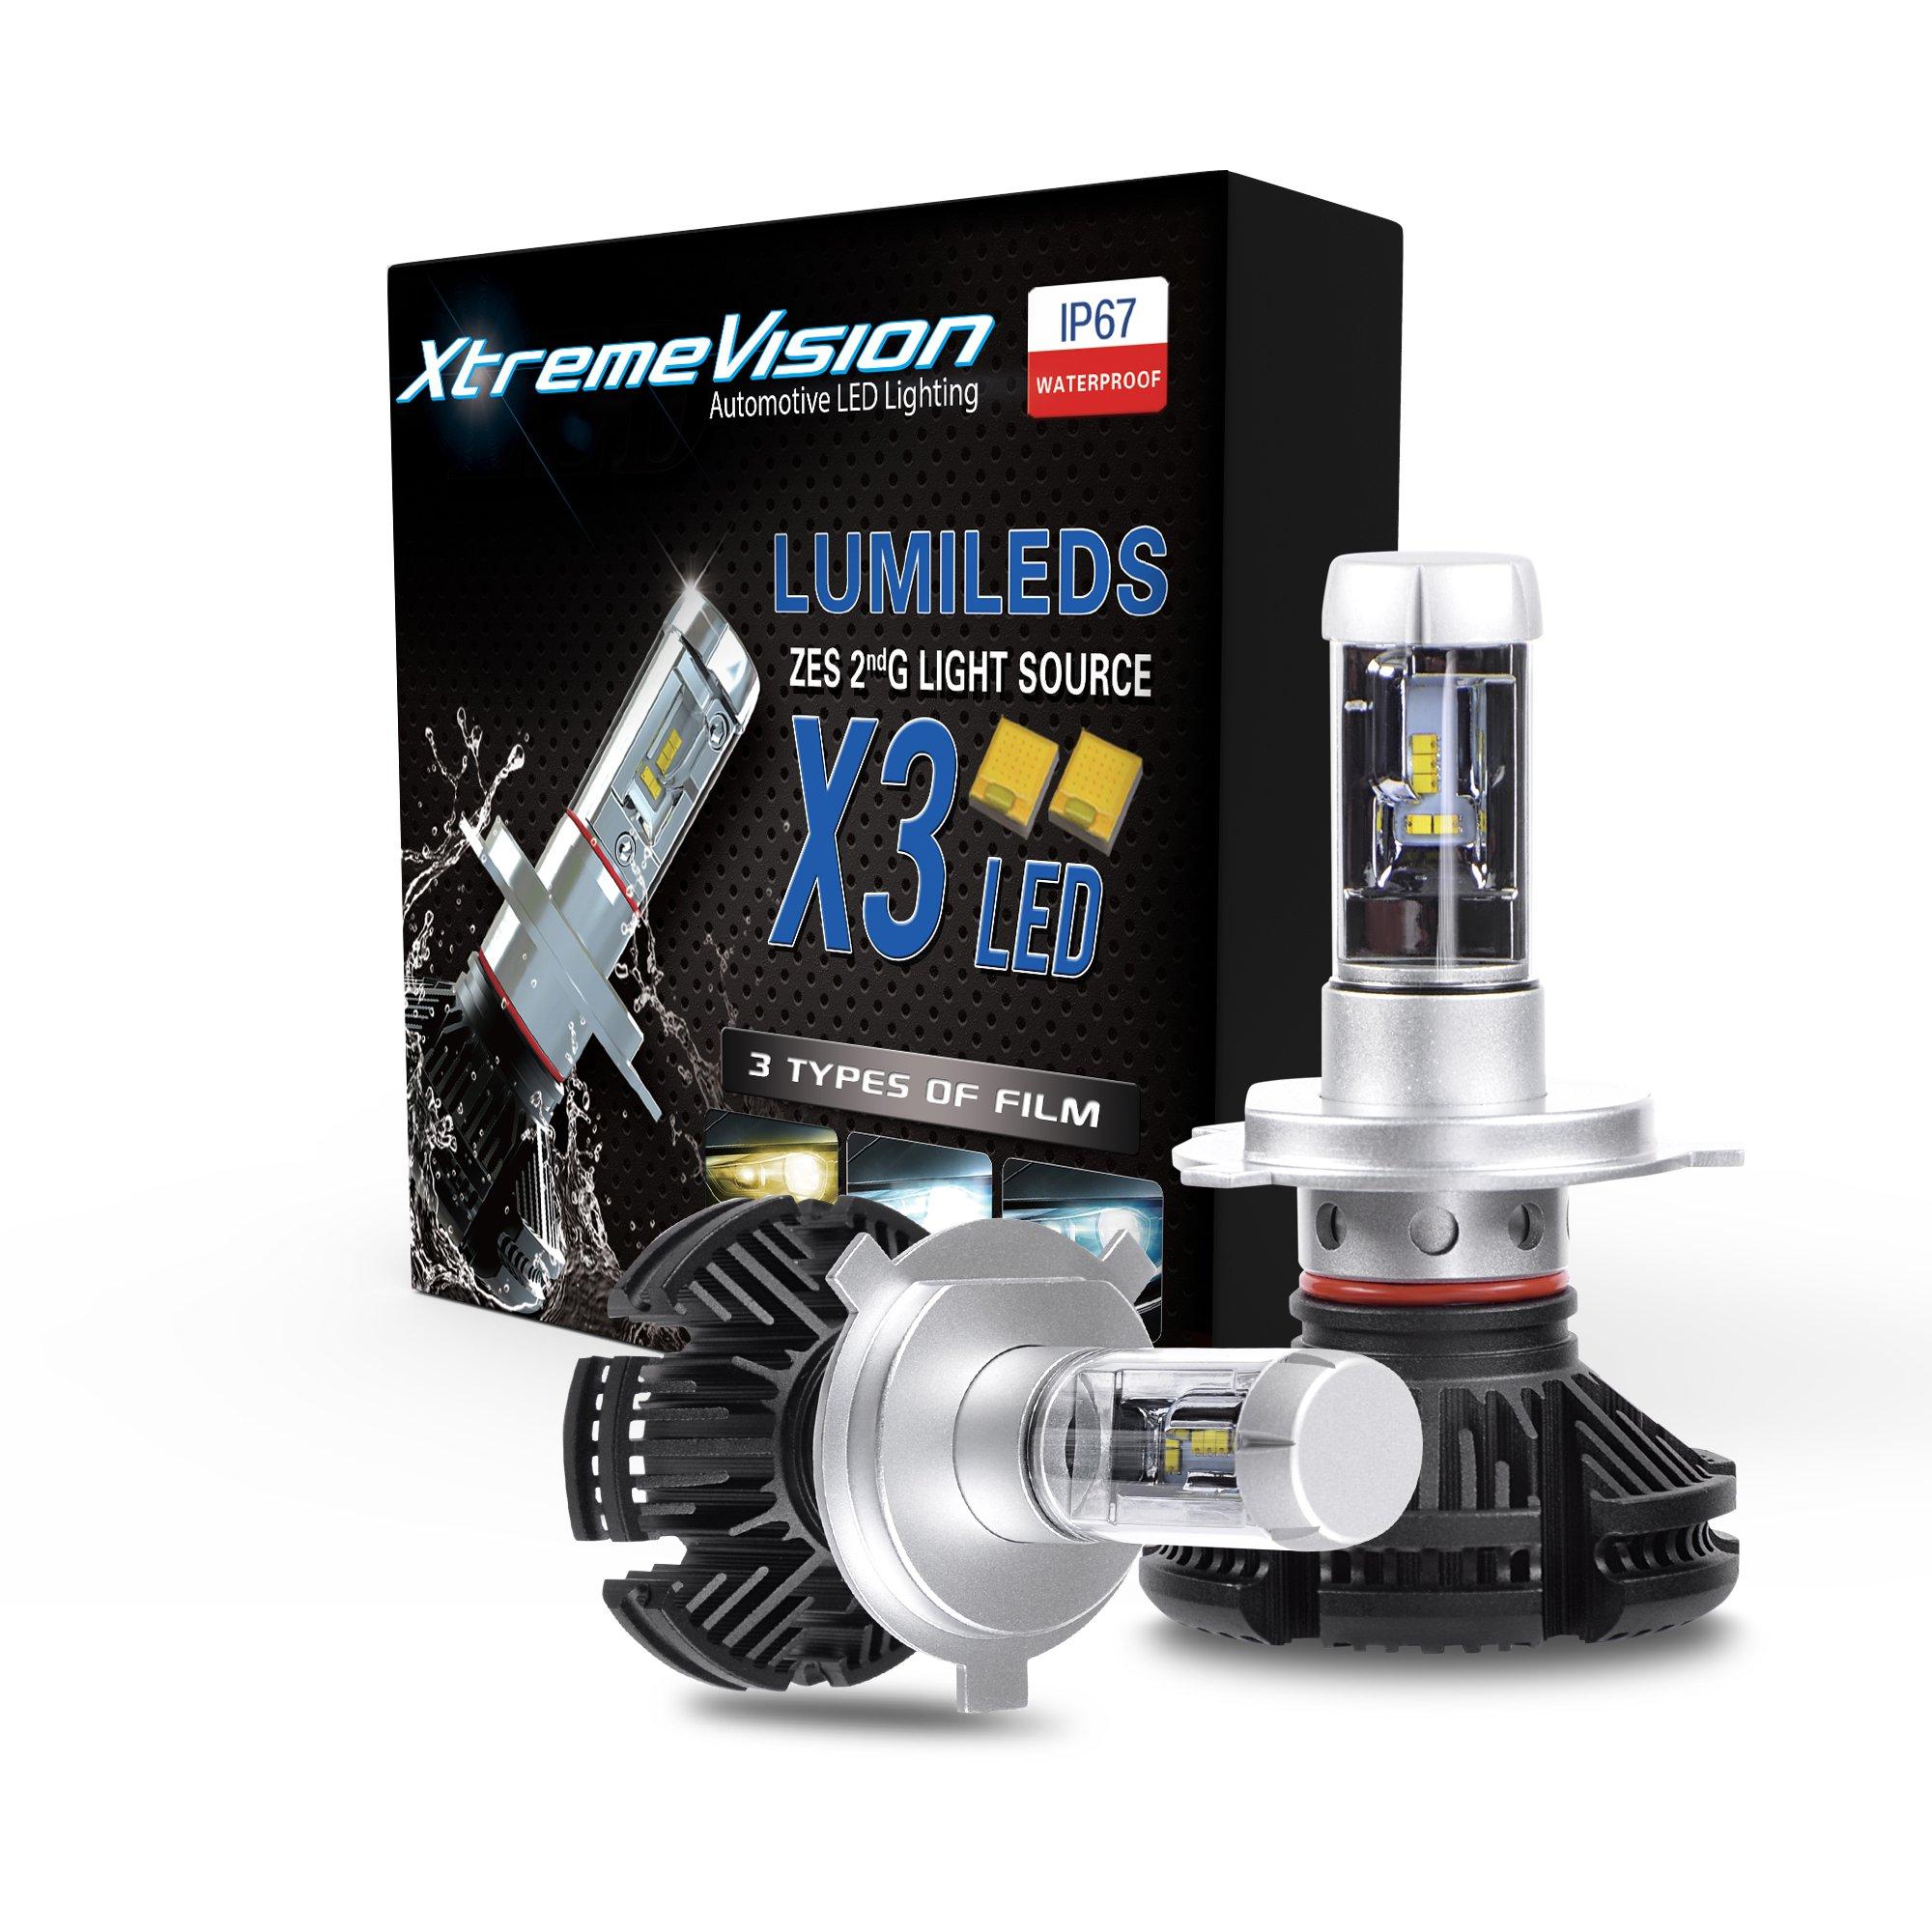 XtremeVision X3 50W 12,000LM - H4/9003 Dual Beam LED Headlight Conversion Kit - 3000K 6500K 8000K PHILIPS ZES LED - 2018 Model